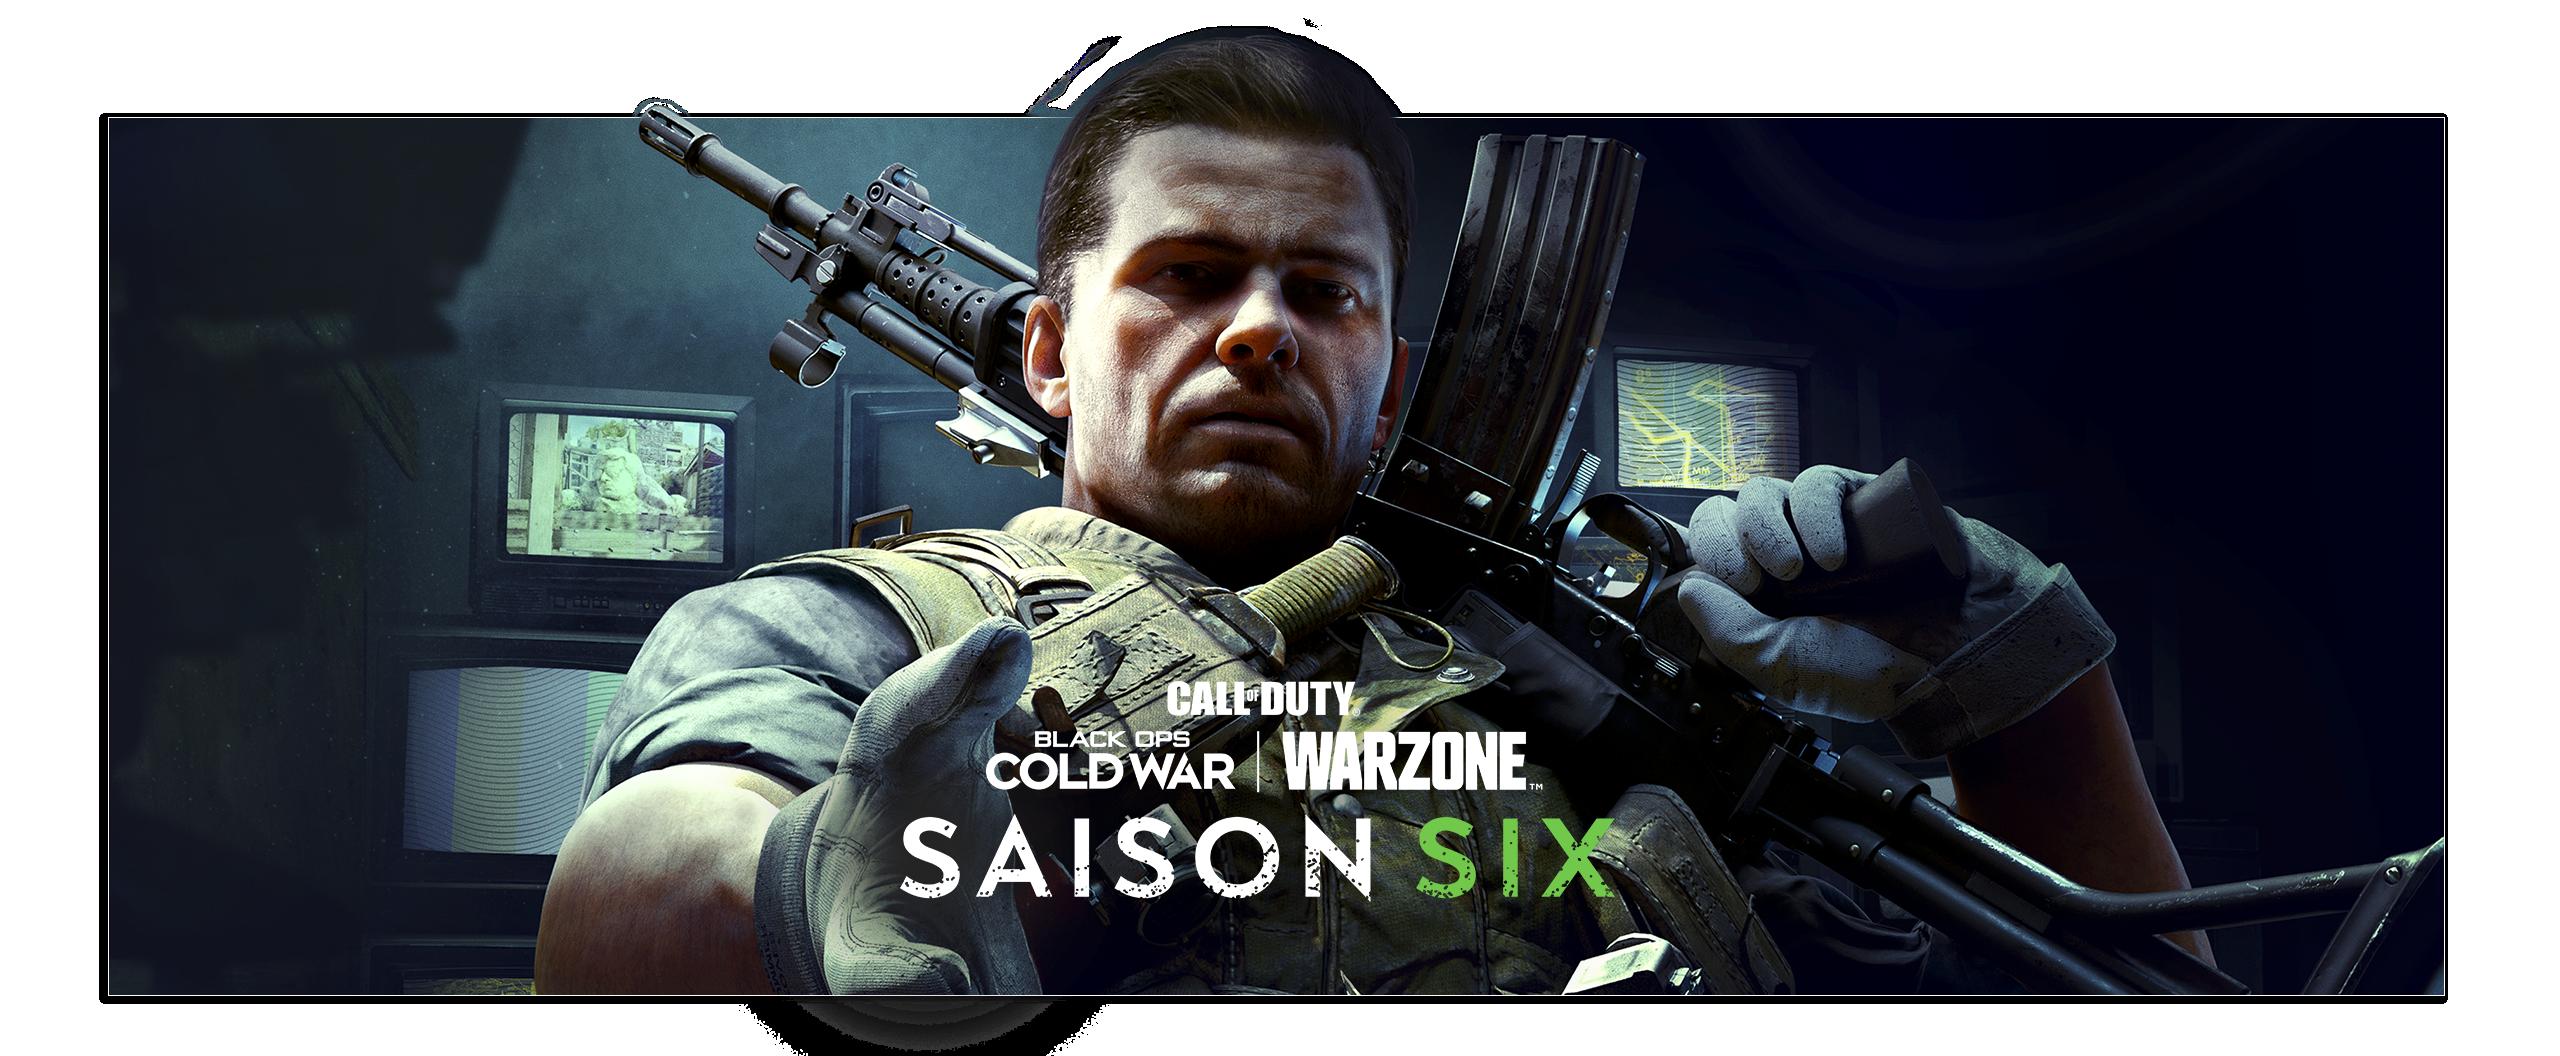 Call of Duty Black Ops Cold War Season 6 art work